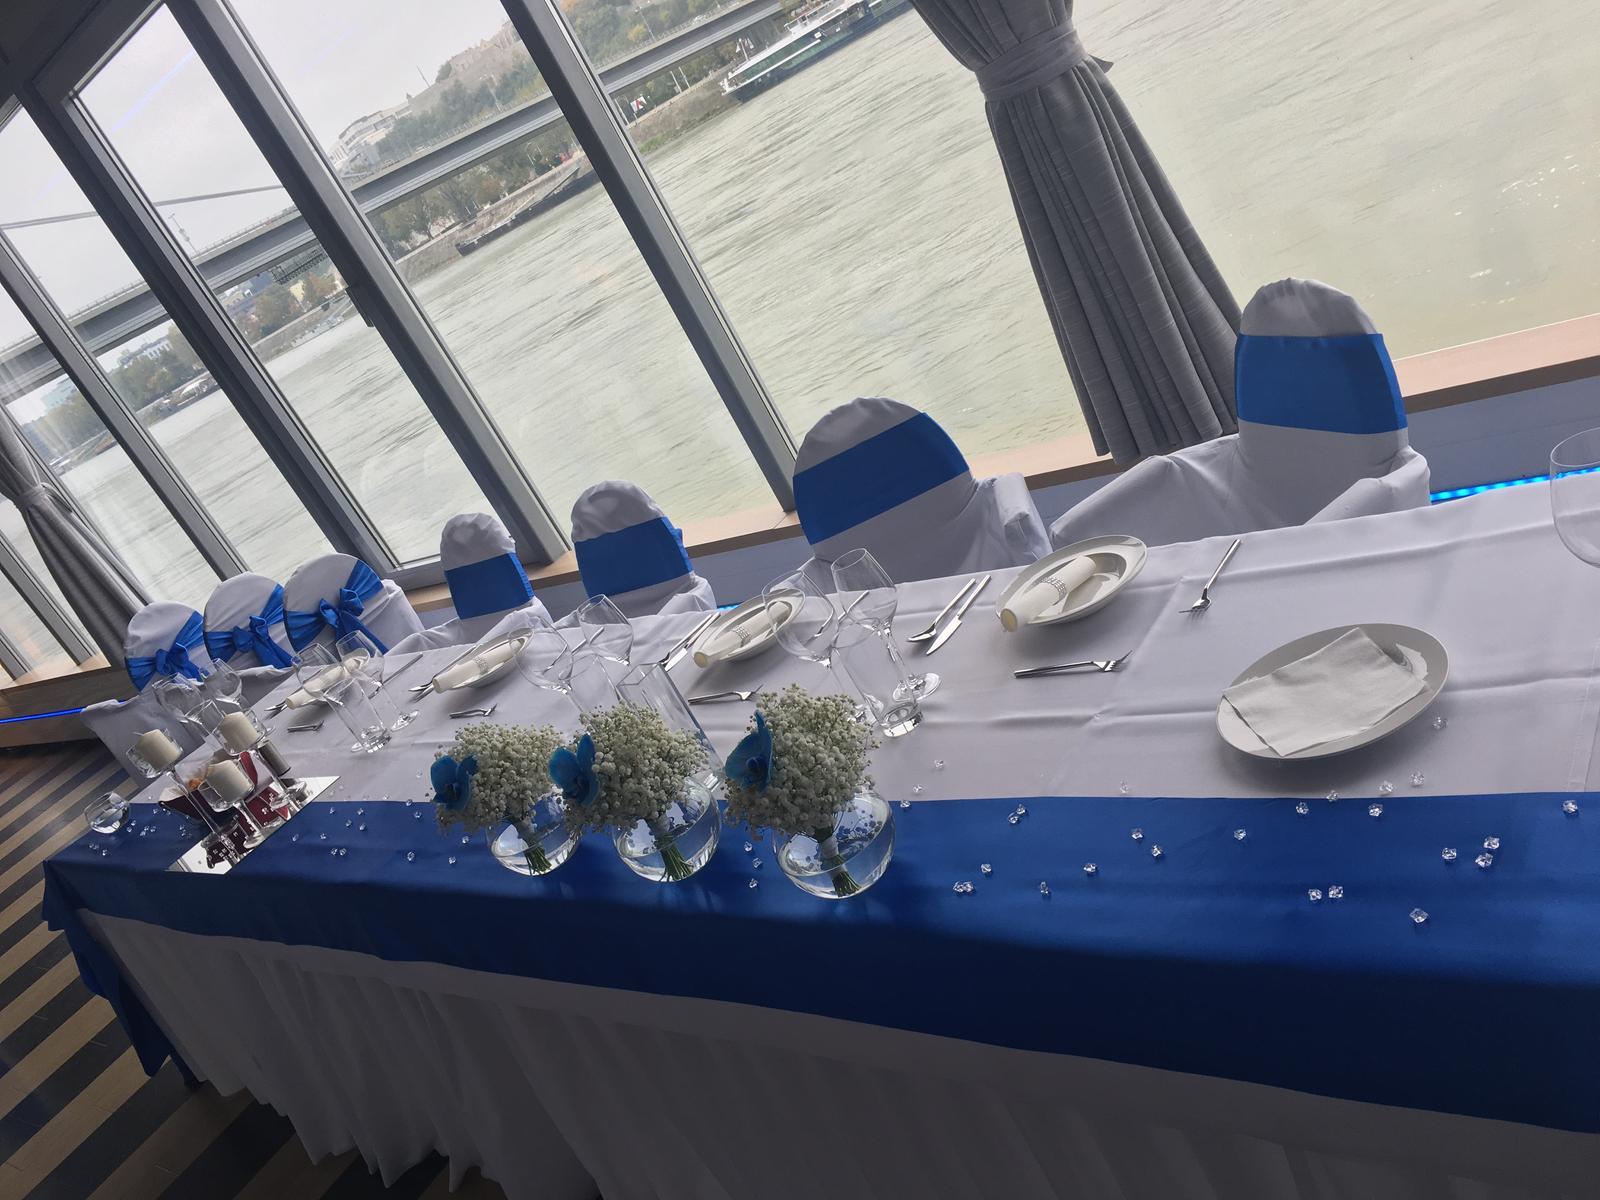 Svadba na Dunaji - Obrázok č. 3